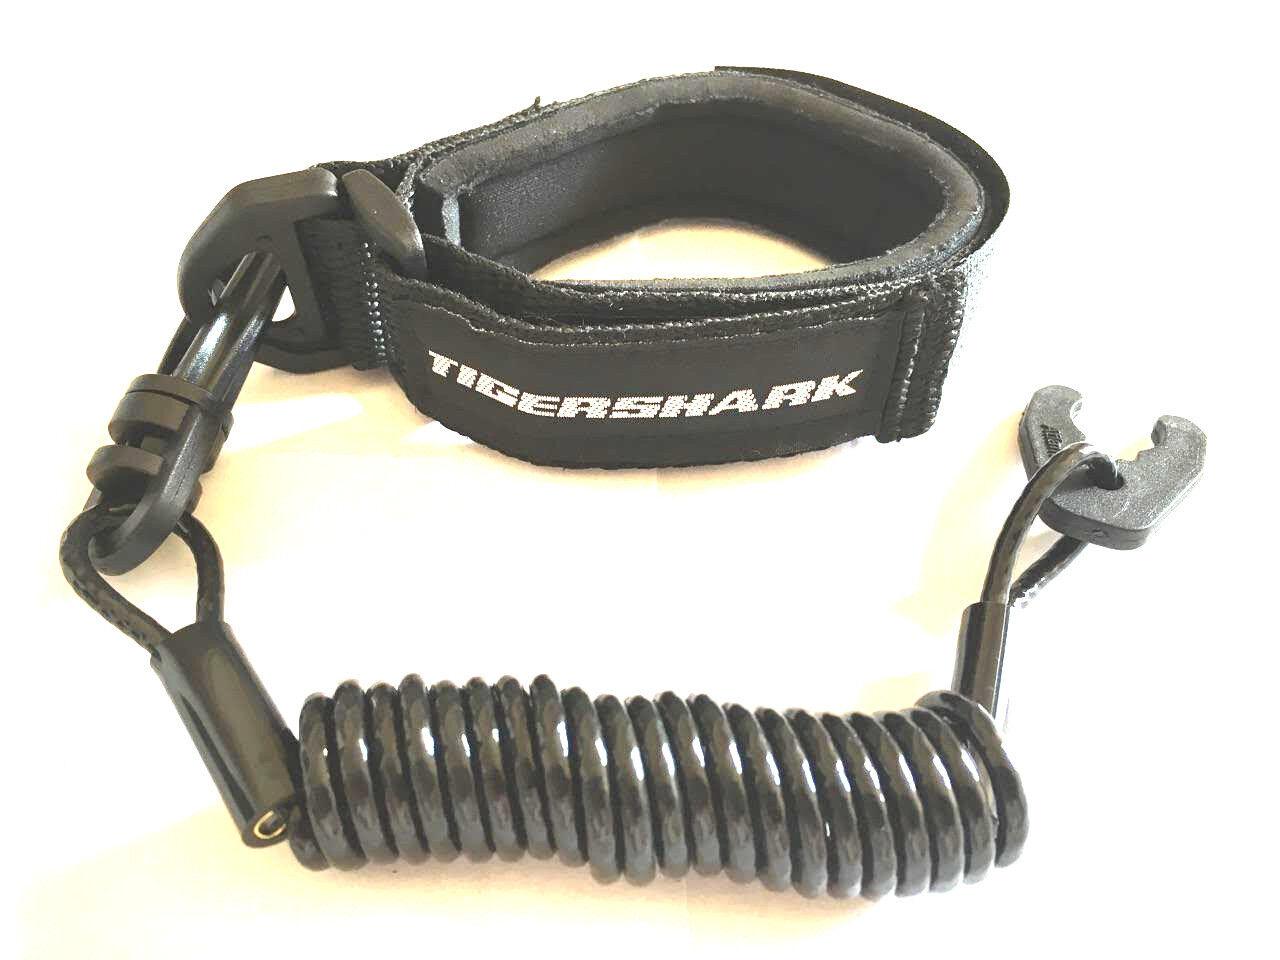 Tigershark Barracuda Daytona Monte Carlo Monteg Lanyard Wrist Band